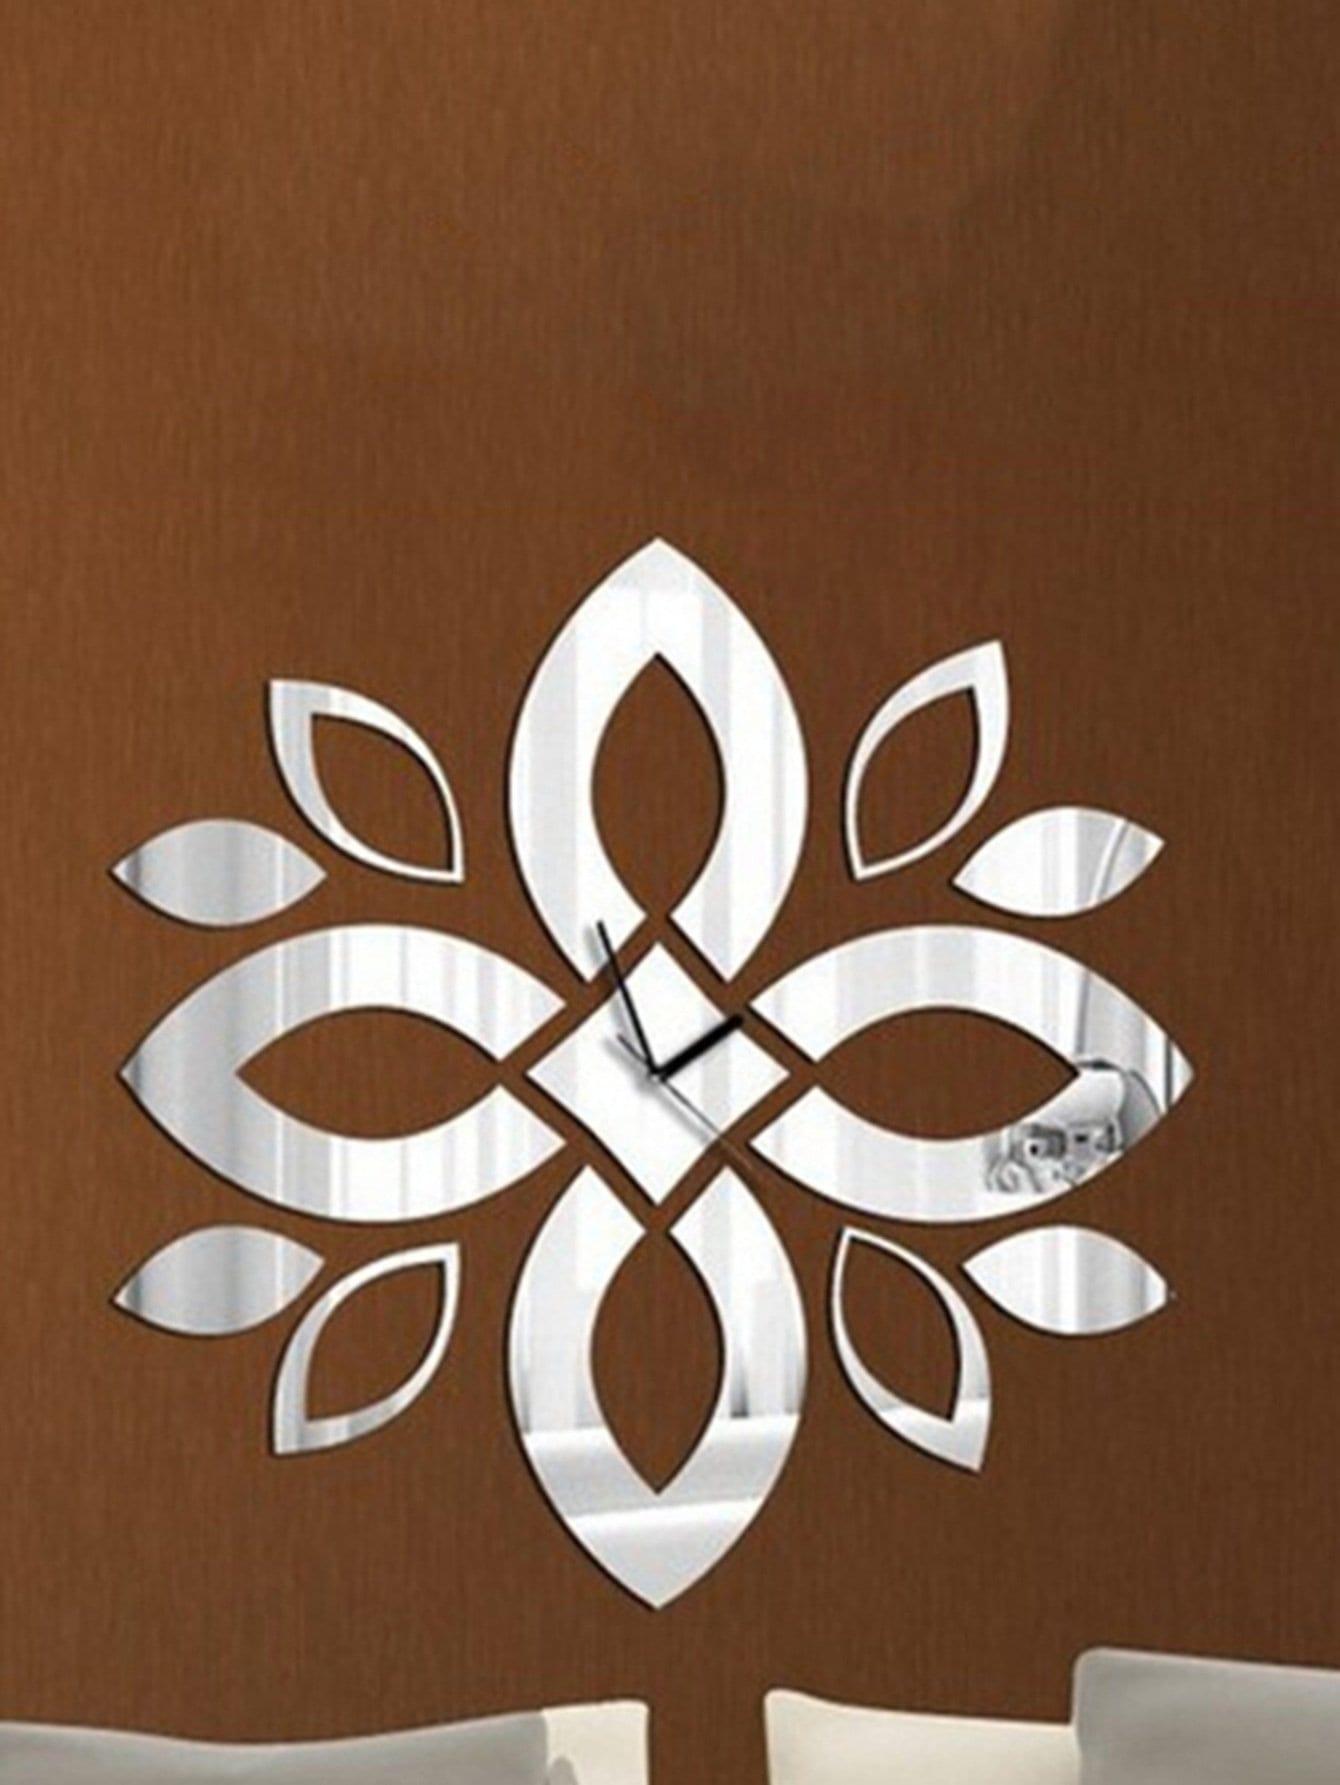 Flower Shape Clock Mirror Wall Sticker 13pcs все цены